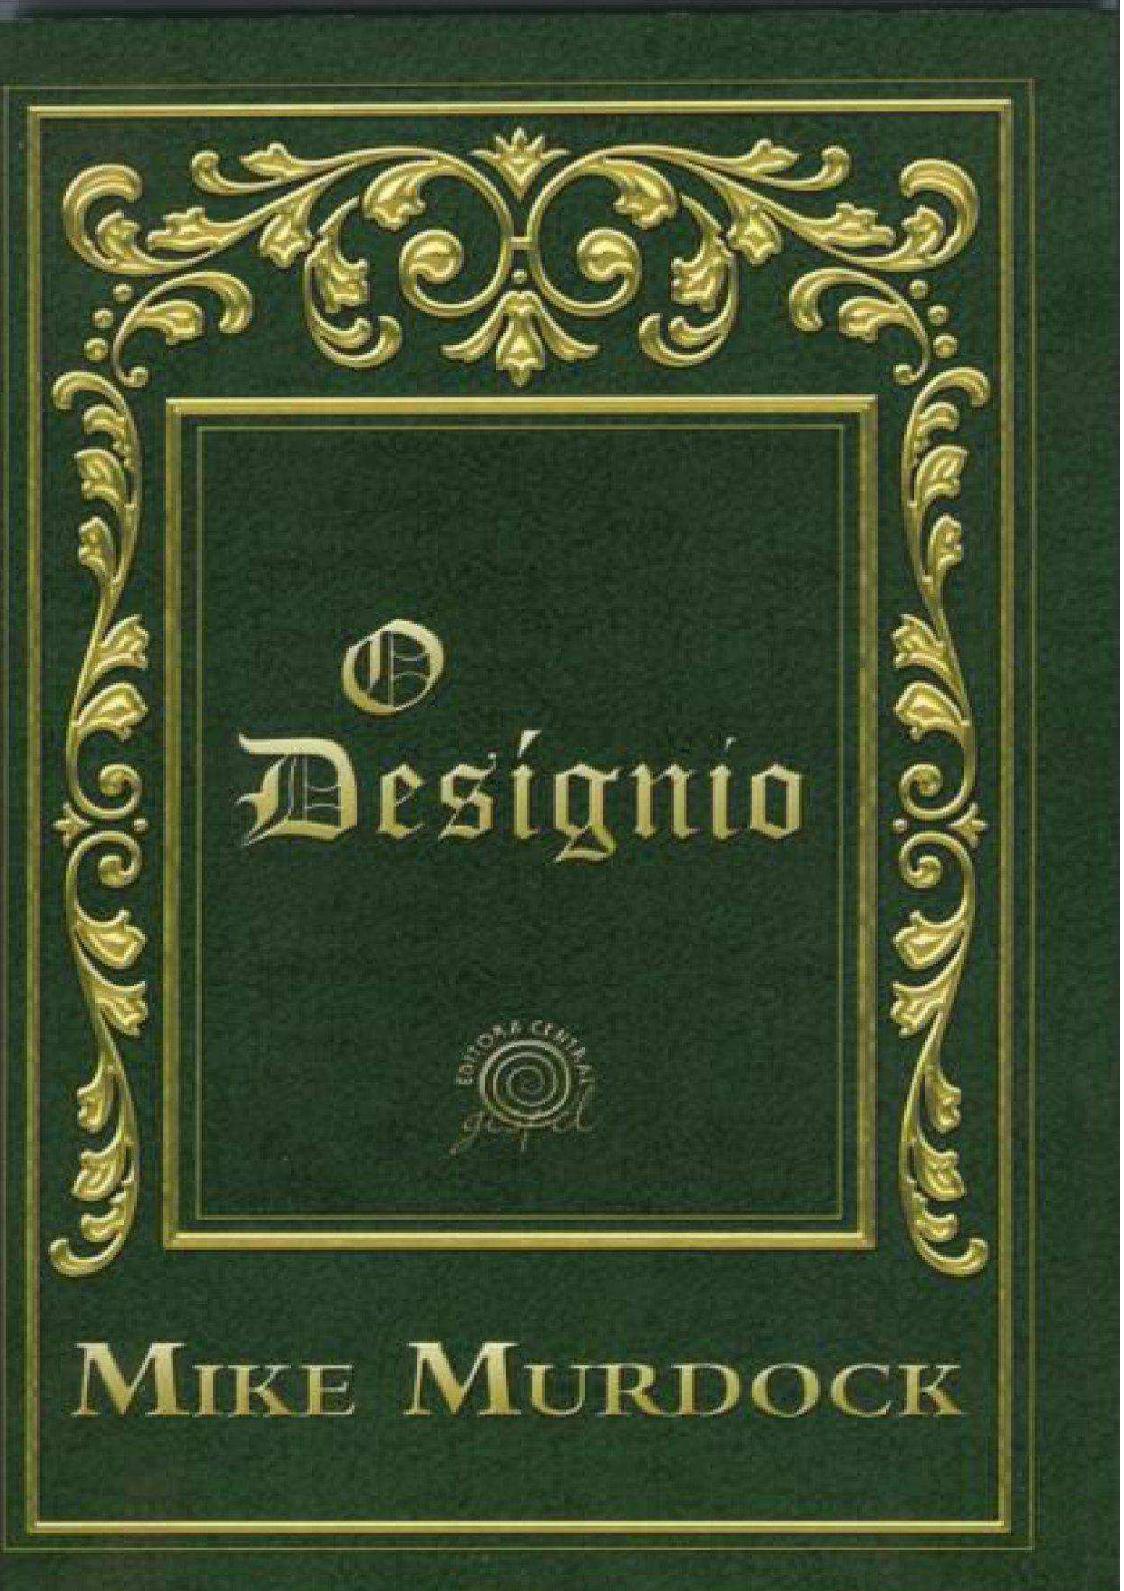 Calaméo - O DESIGNIO - Mike Murdock PDF Download